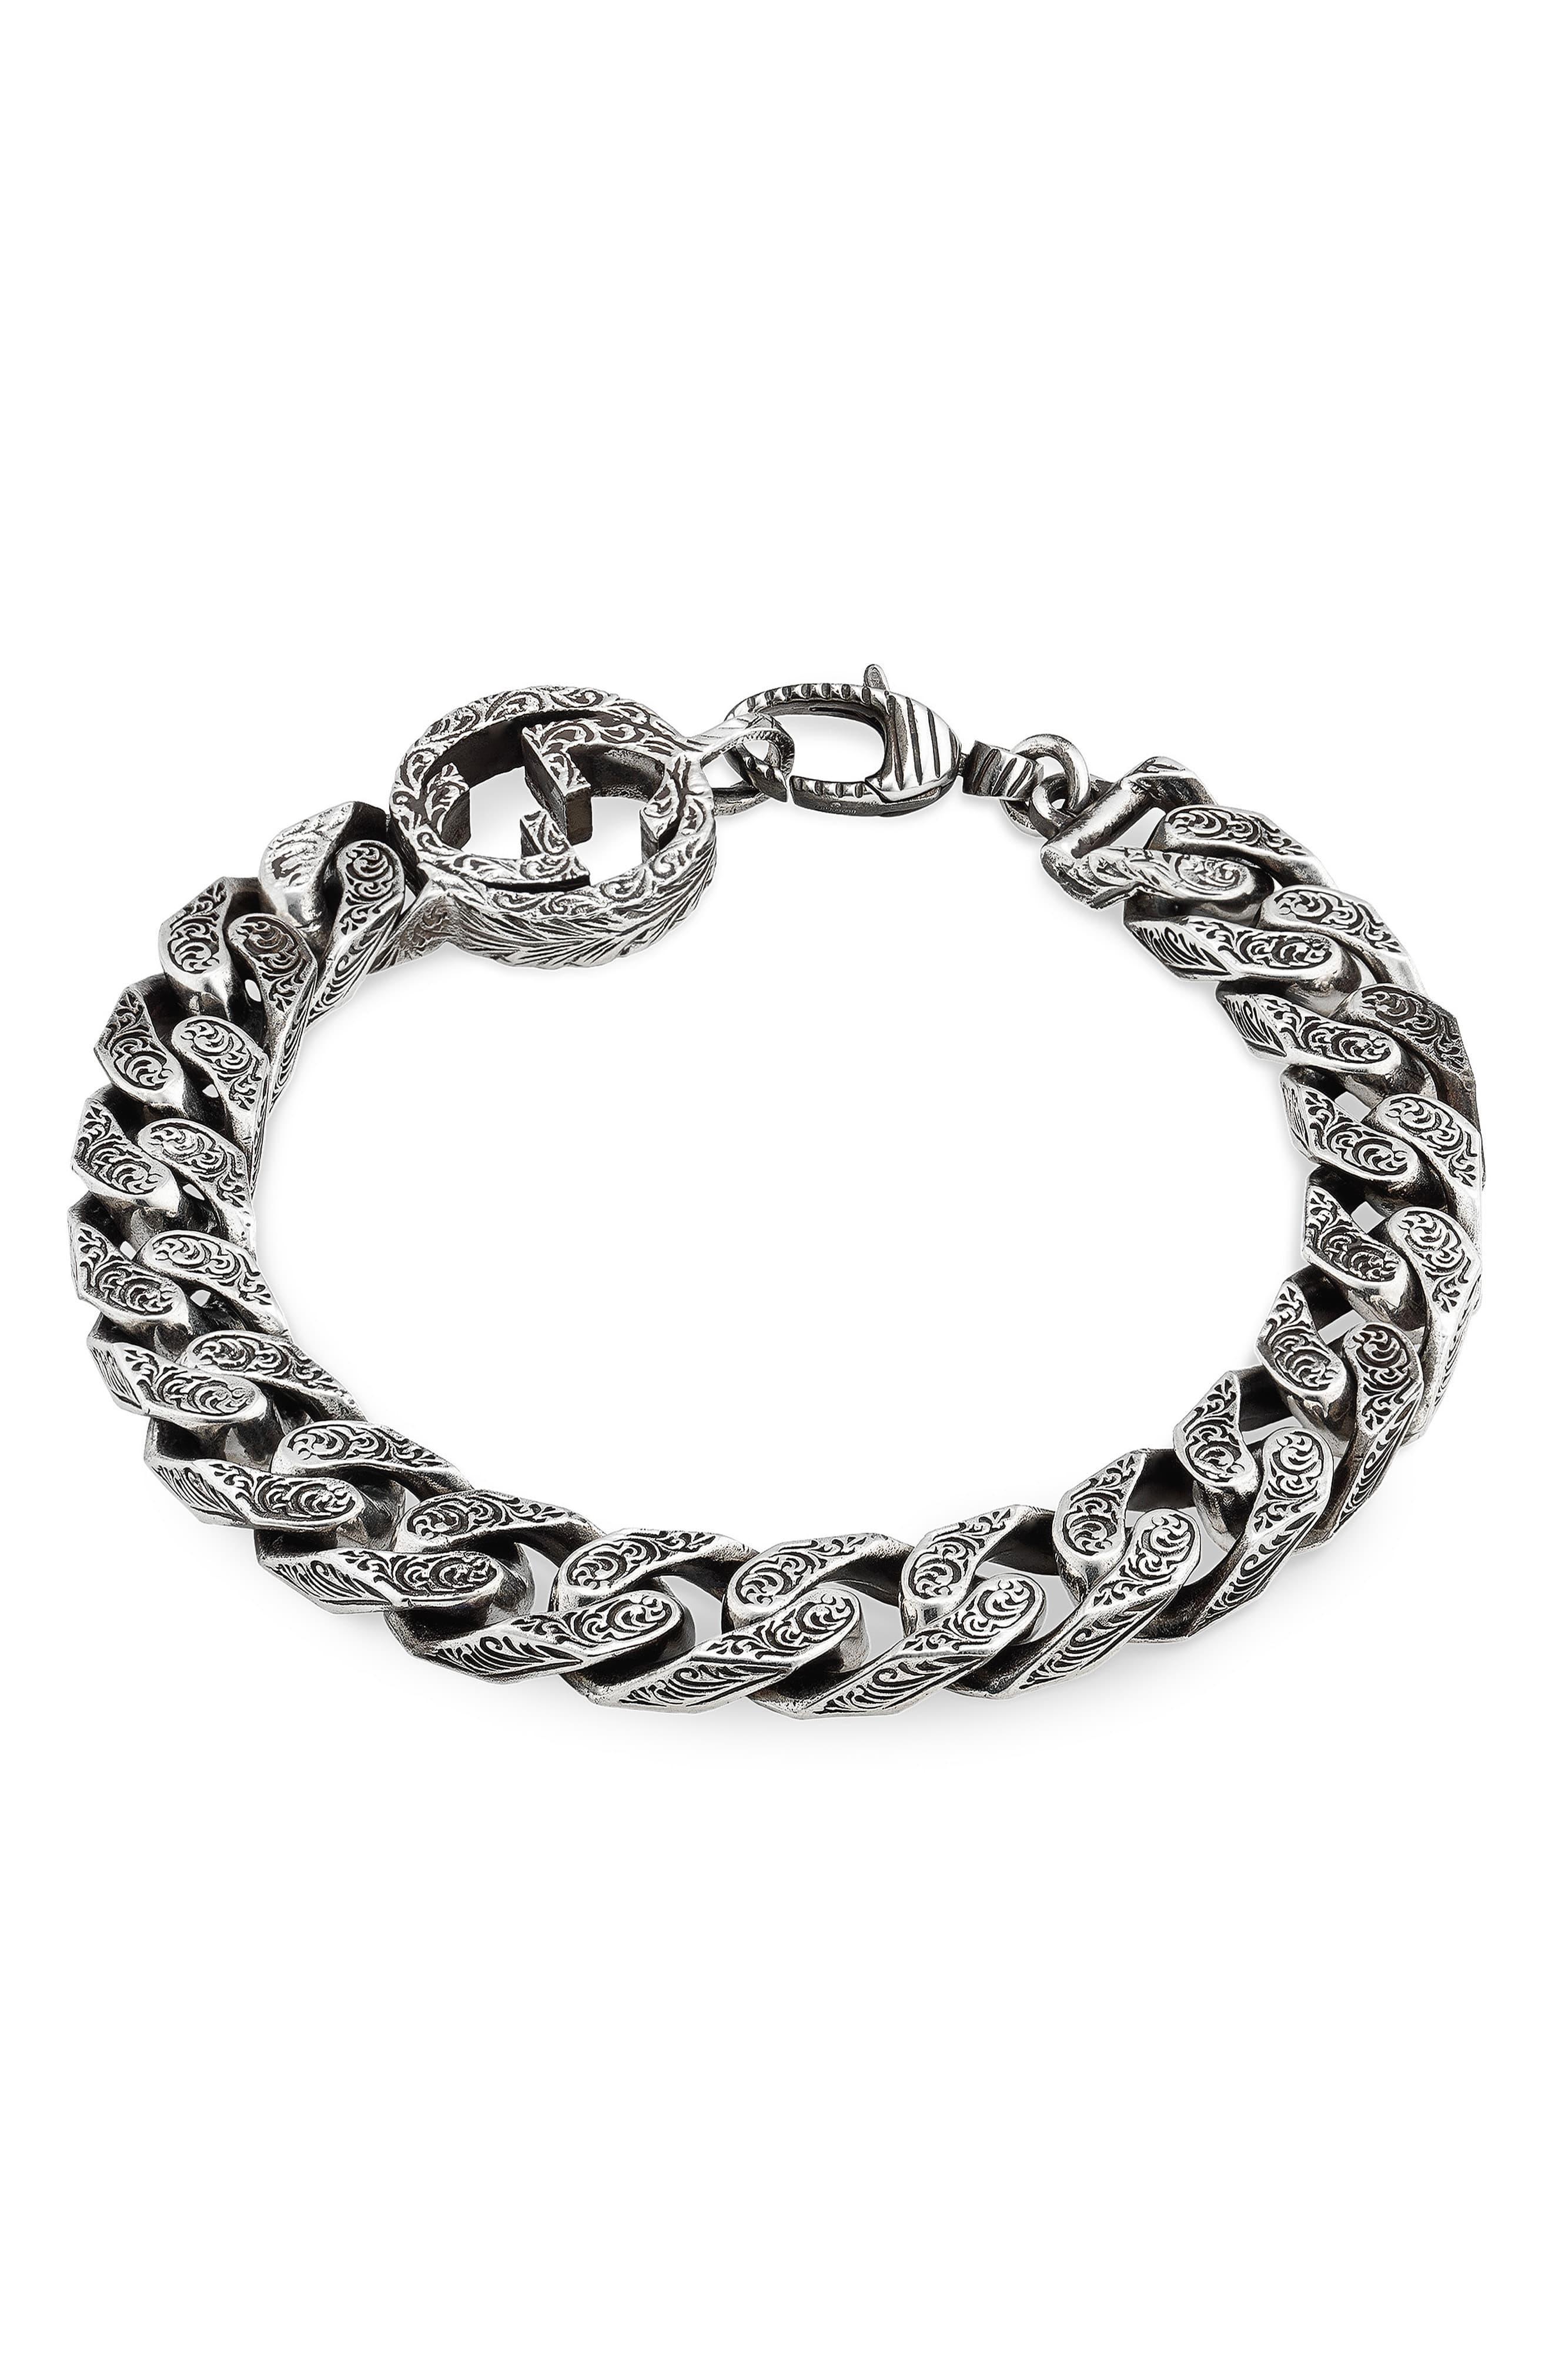 Women Silver Metal Boot Chain Bracelet Anklet Shoe Cutout Square Charm Jewelry